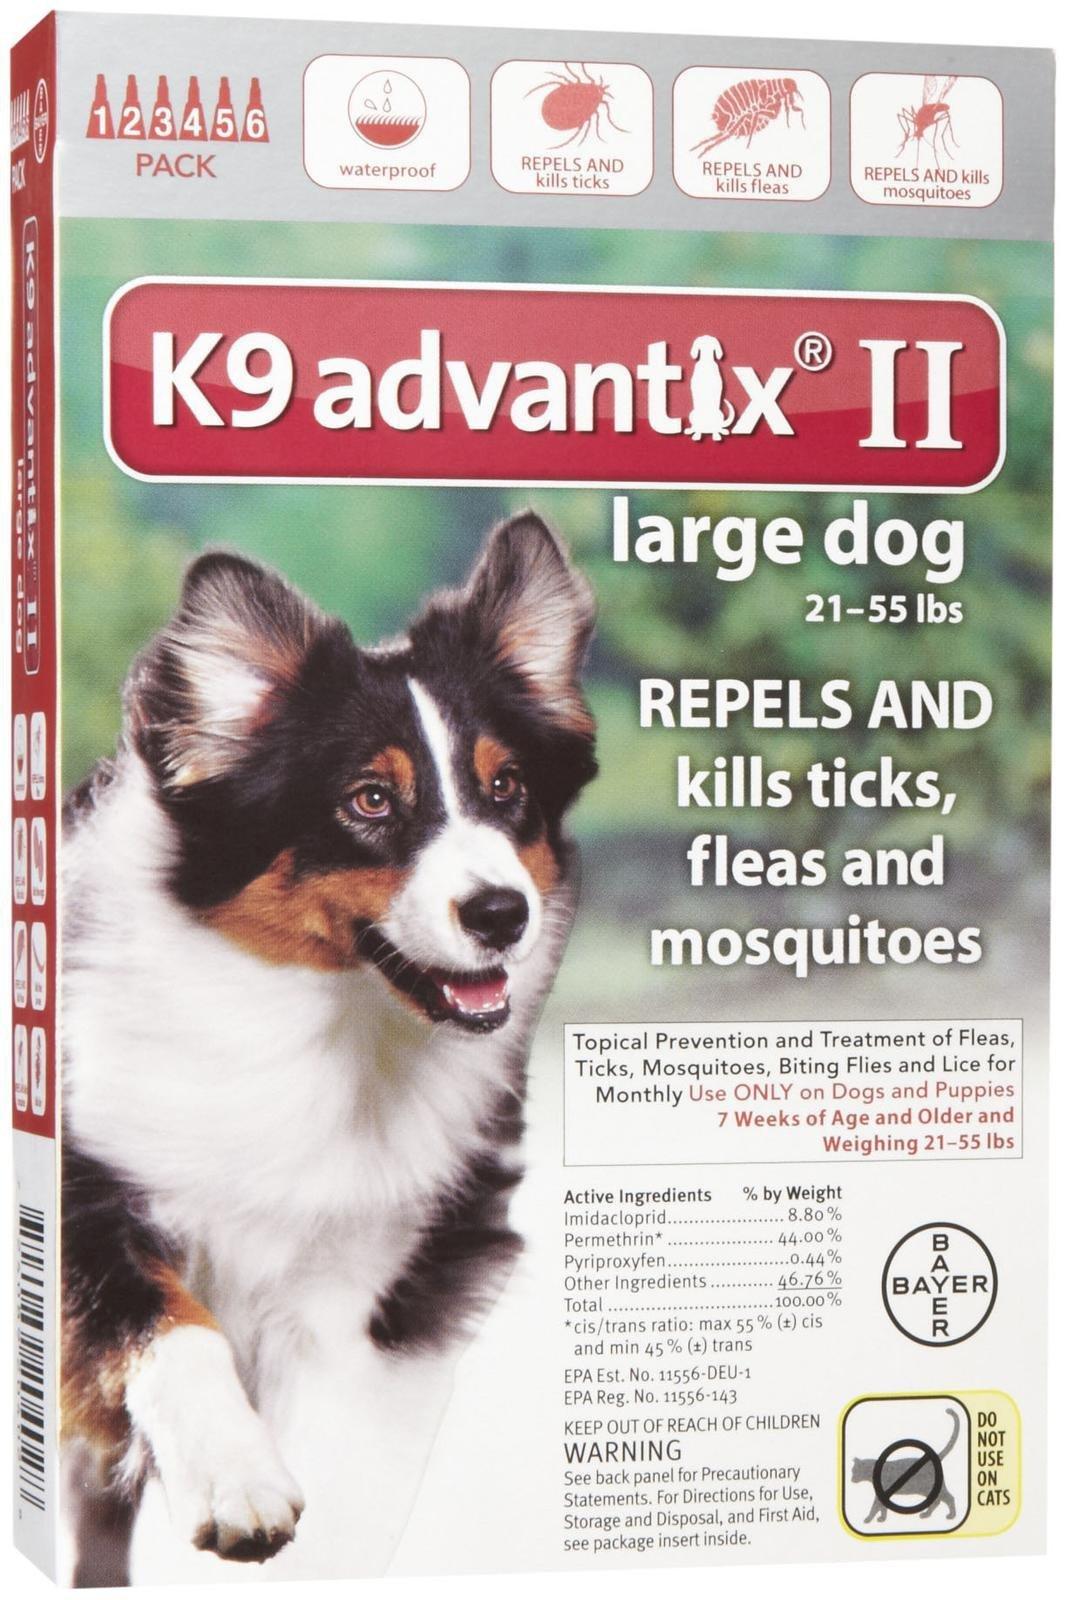 K9 advantix II large dog 21-55 pounds